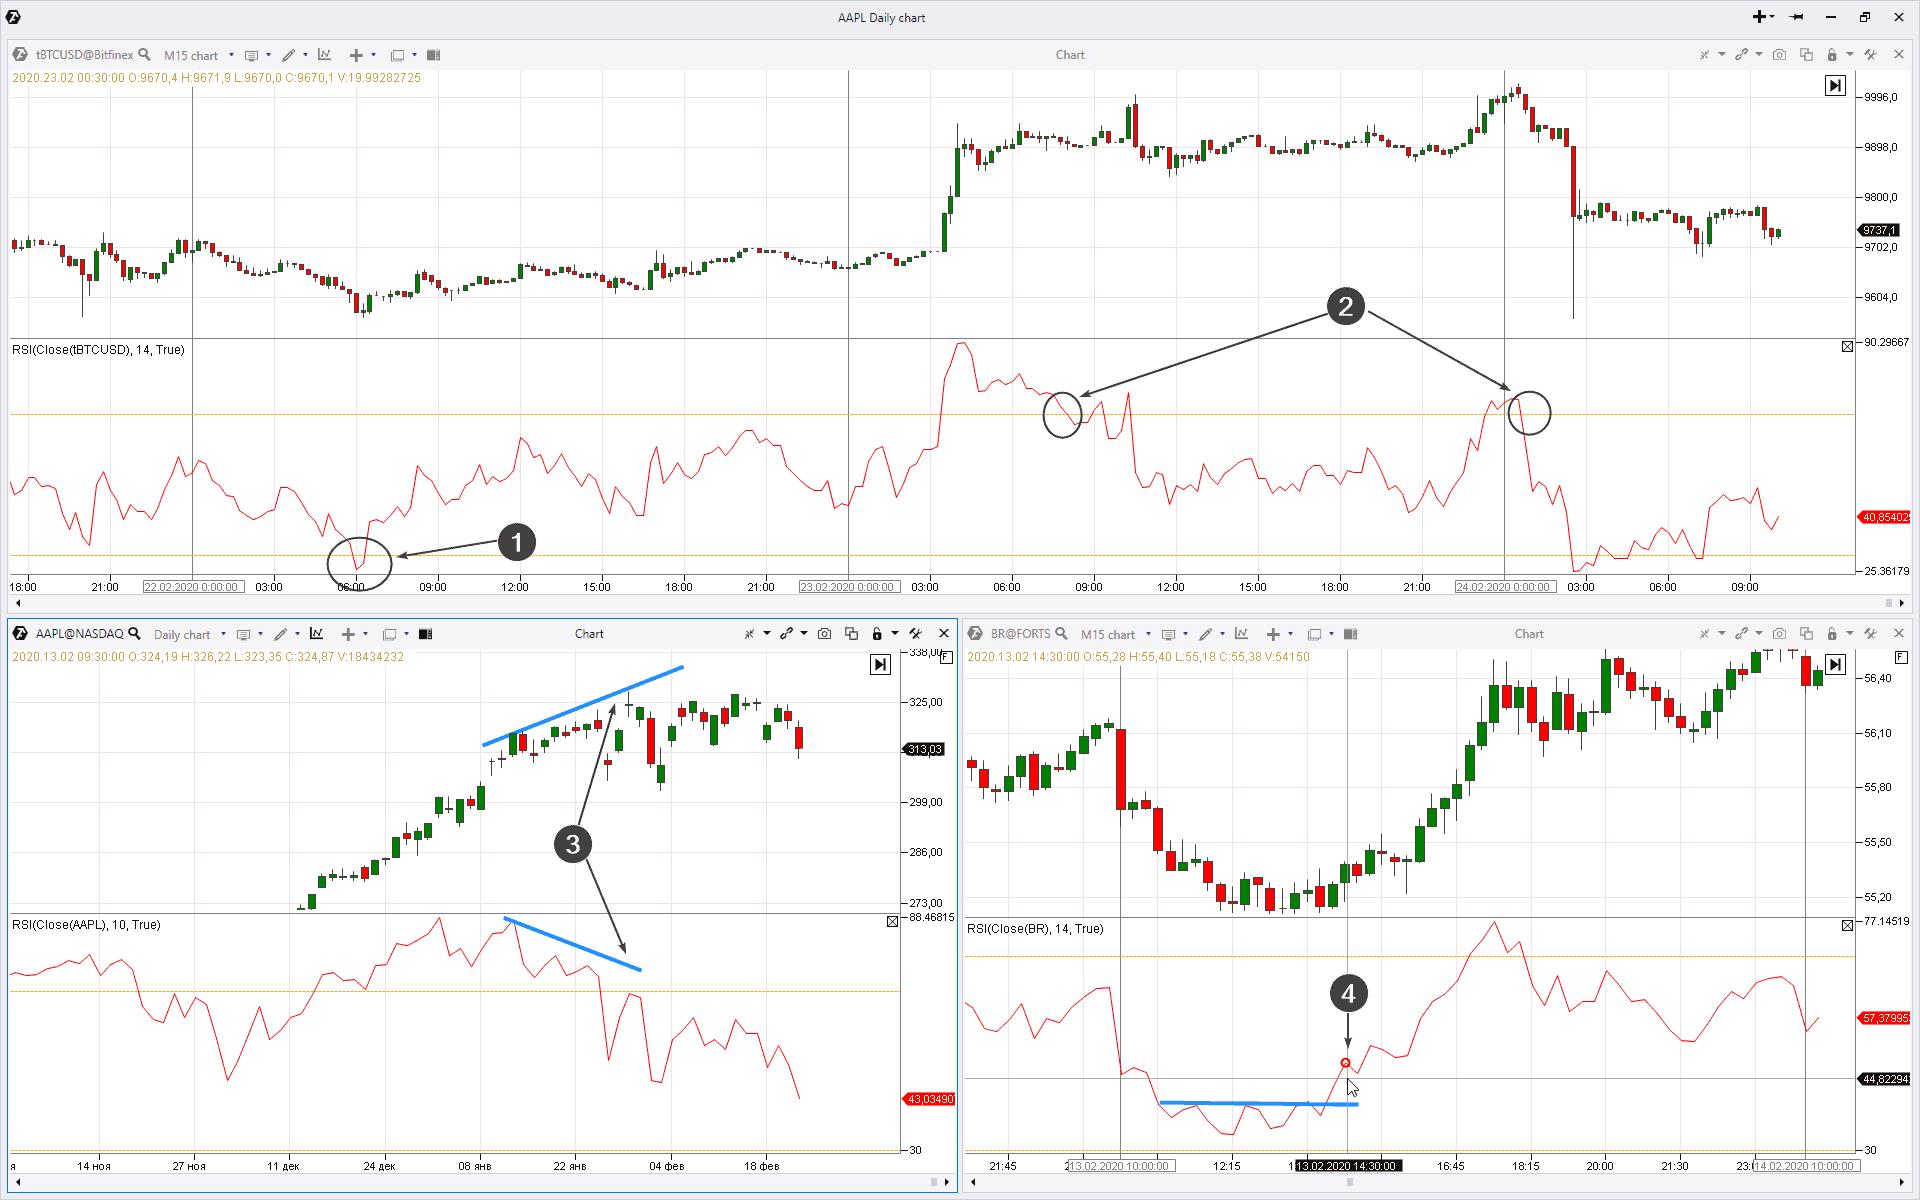 The RSI indicator signals